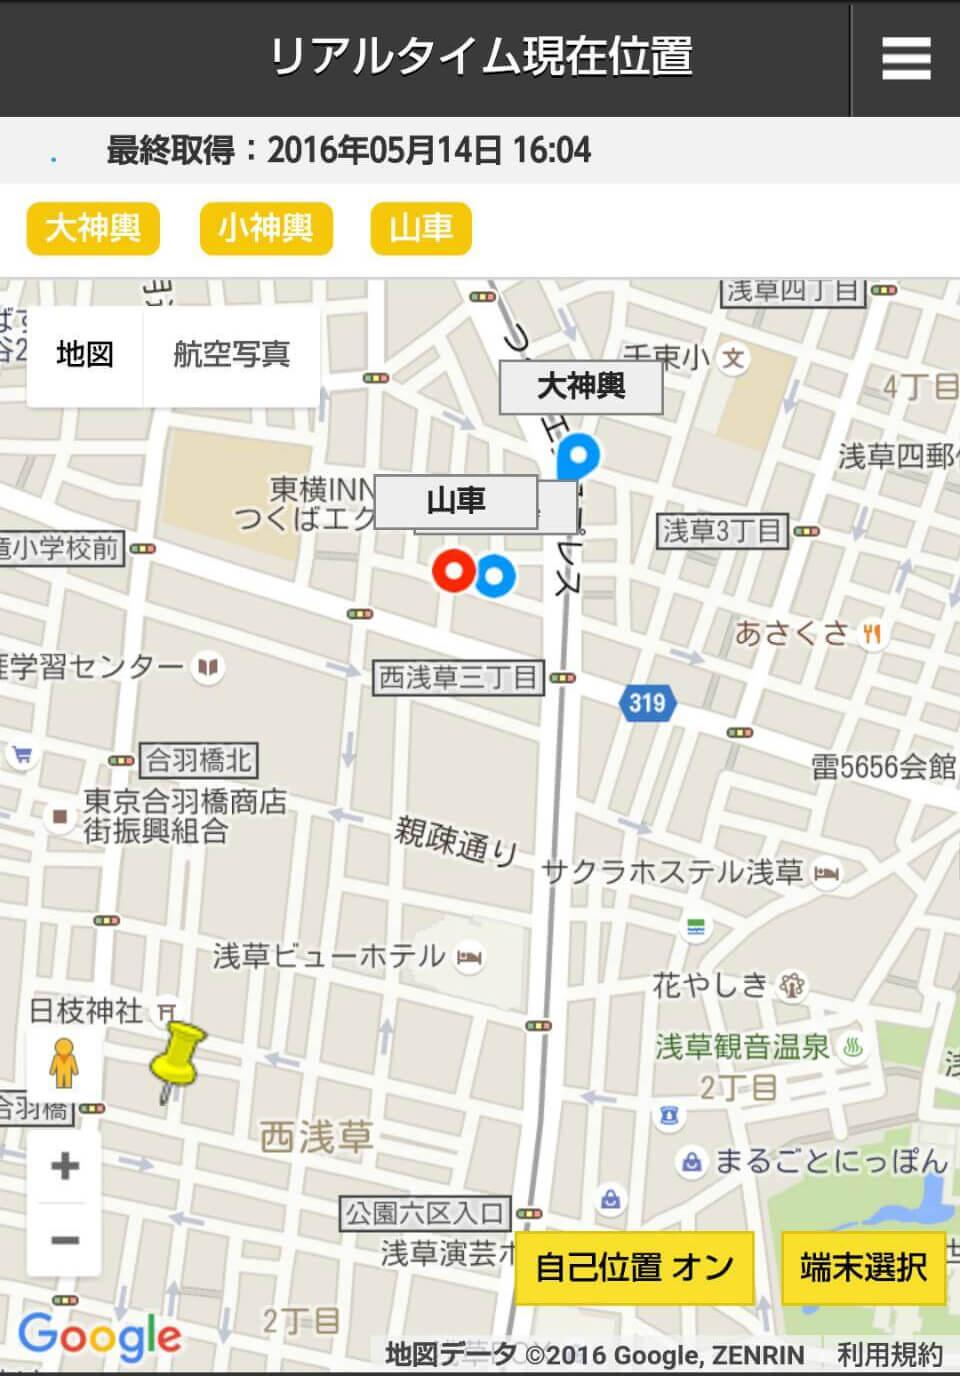 GPS画面